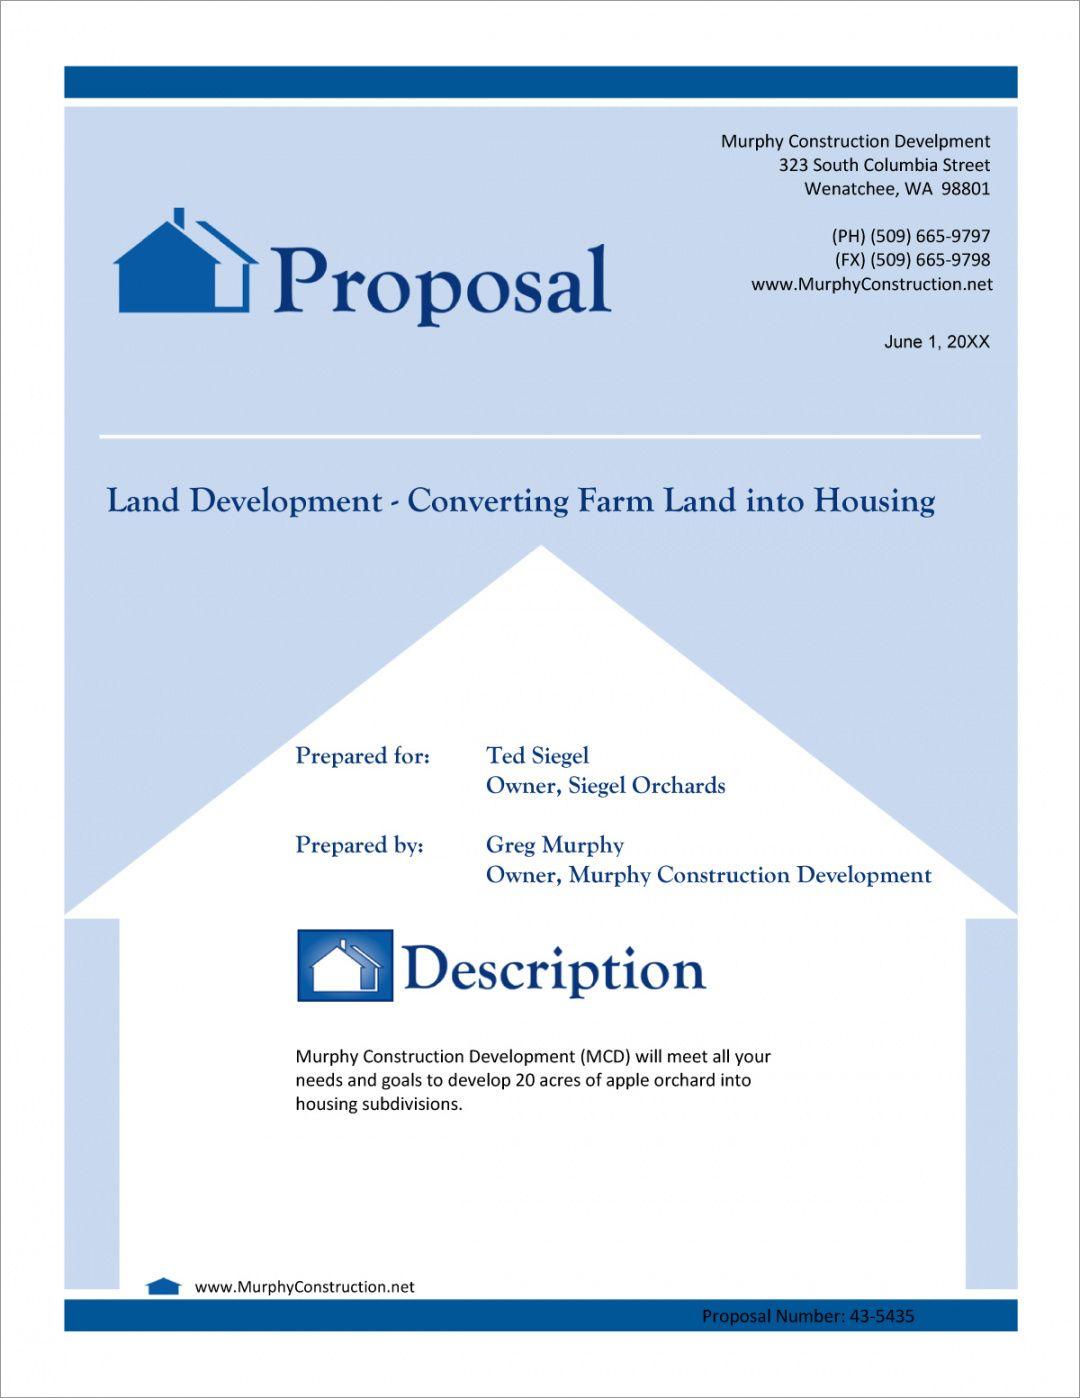 sample real estate land development proposal  5 steps real estate loan proposal template pdf